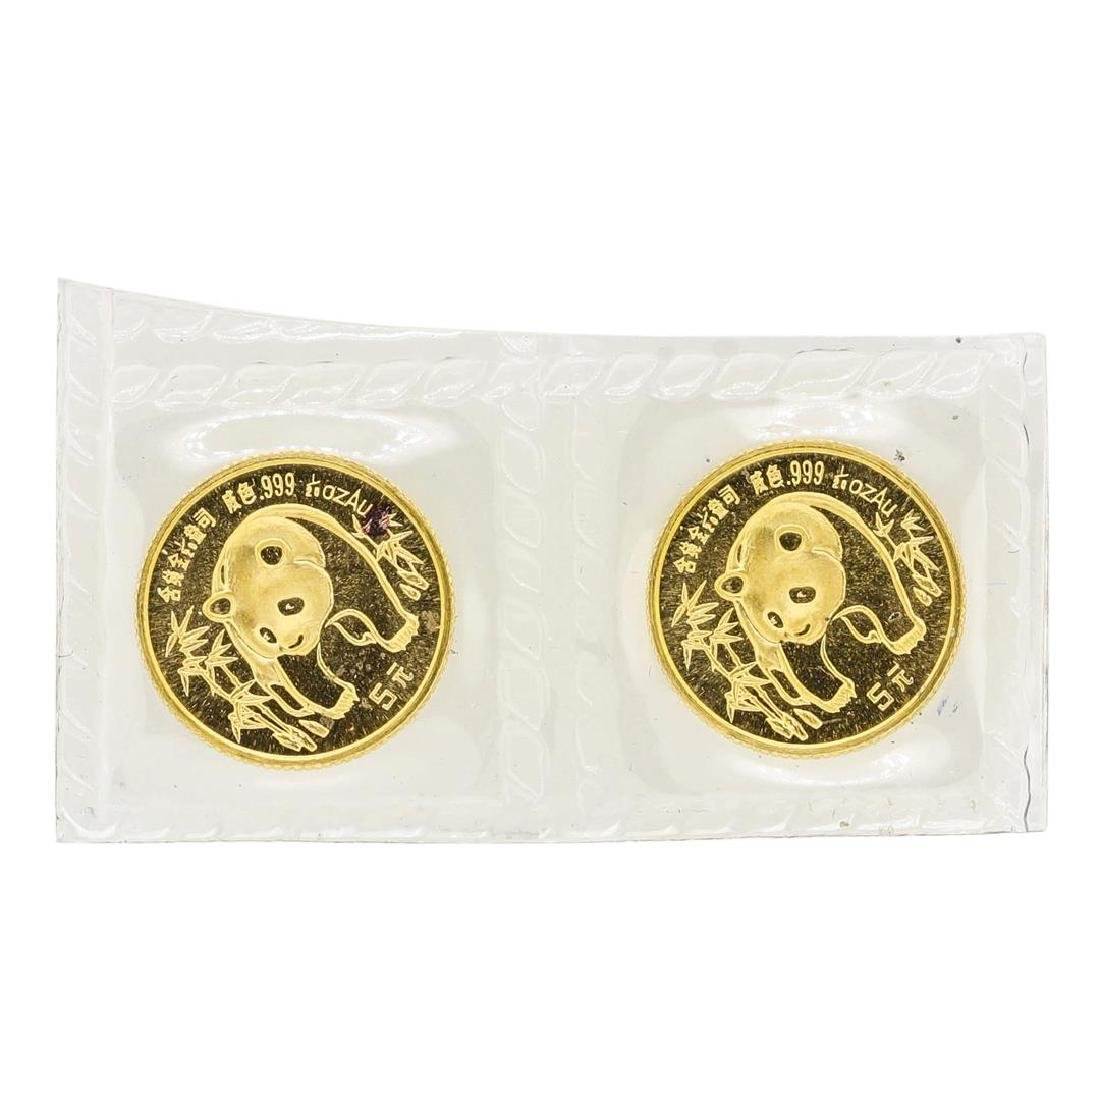 Lot of (2) 1986 1/20 oz. Gold Panda Coins Original